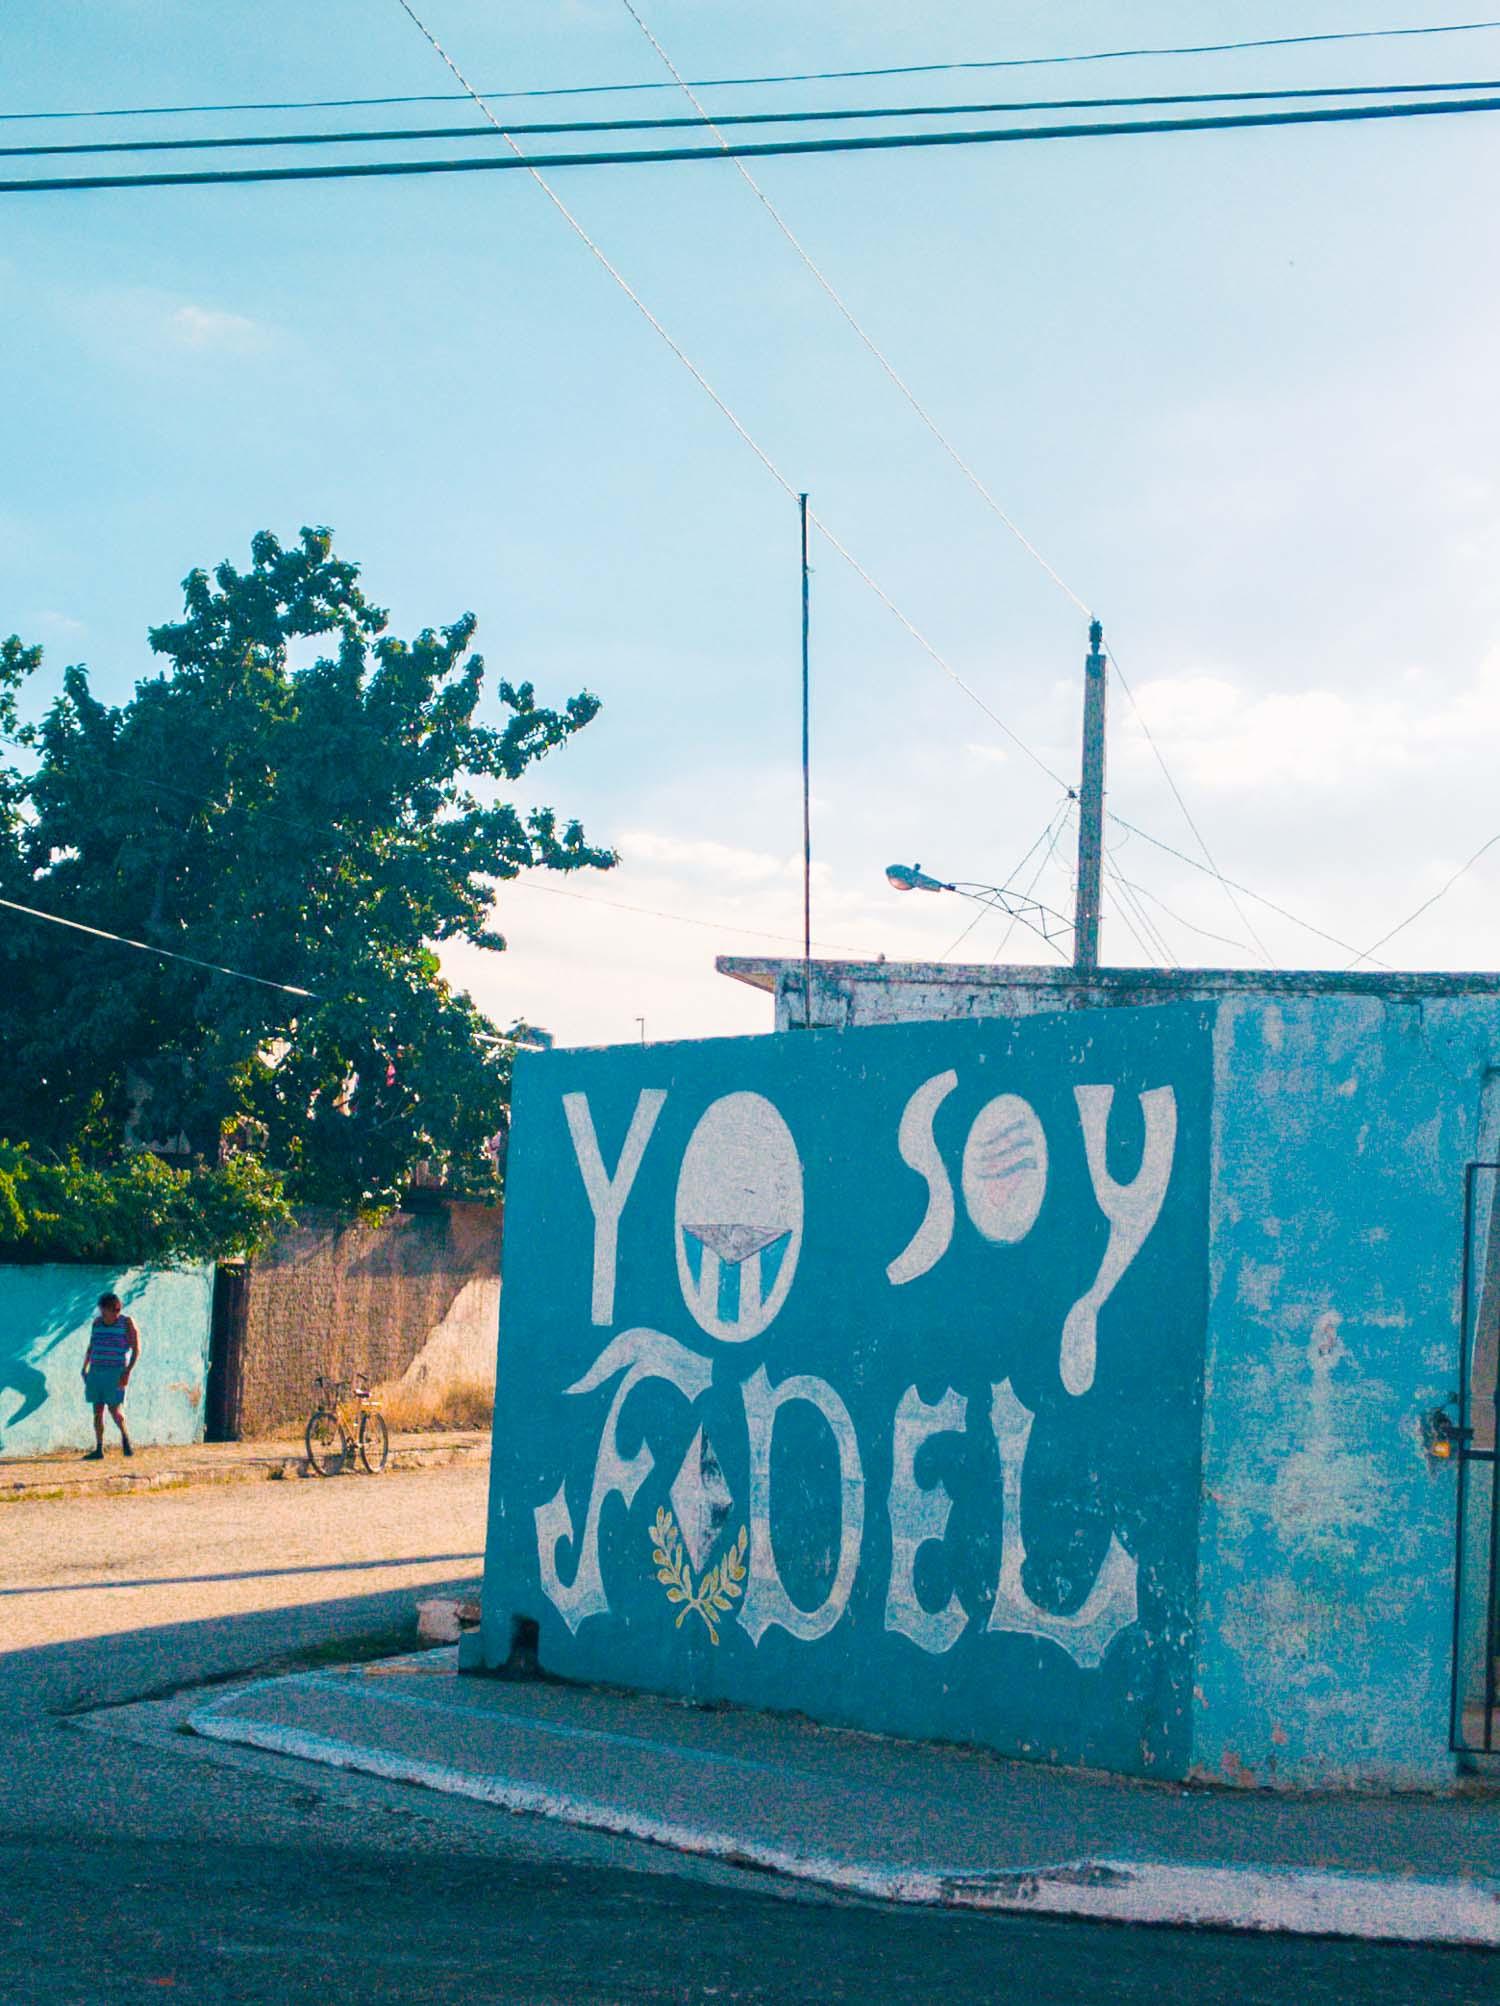 Trinidad Cuba yo soy Fidel sign.